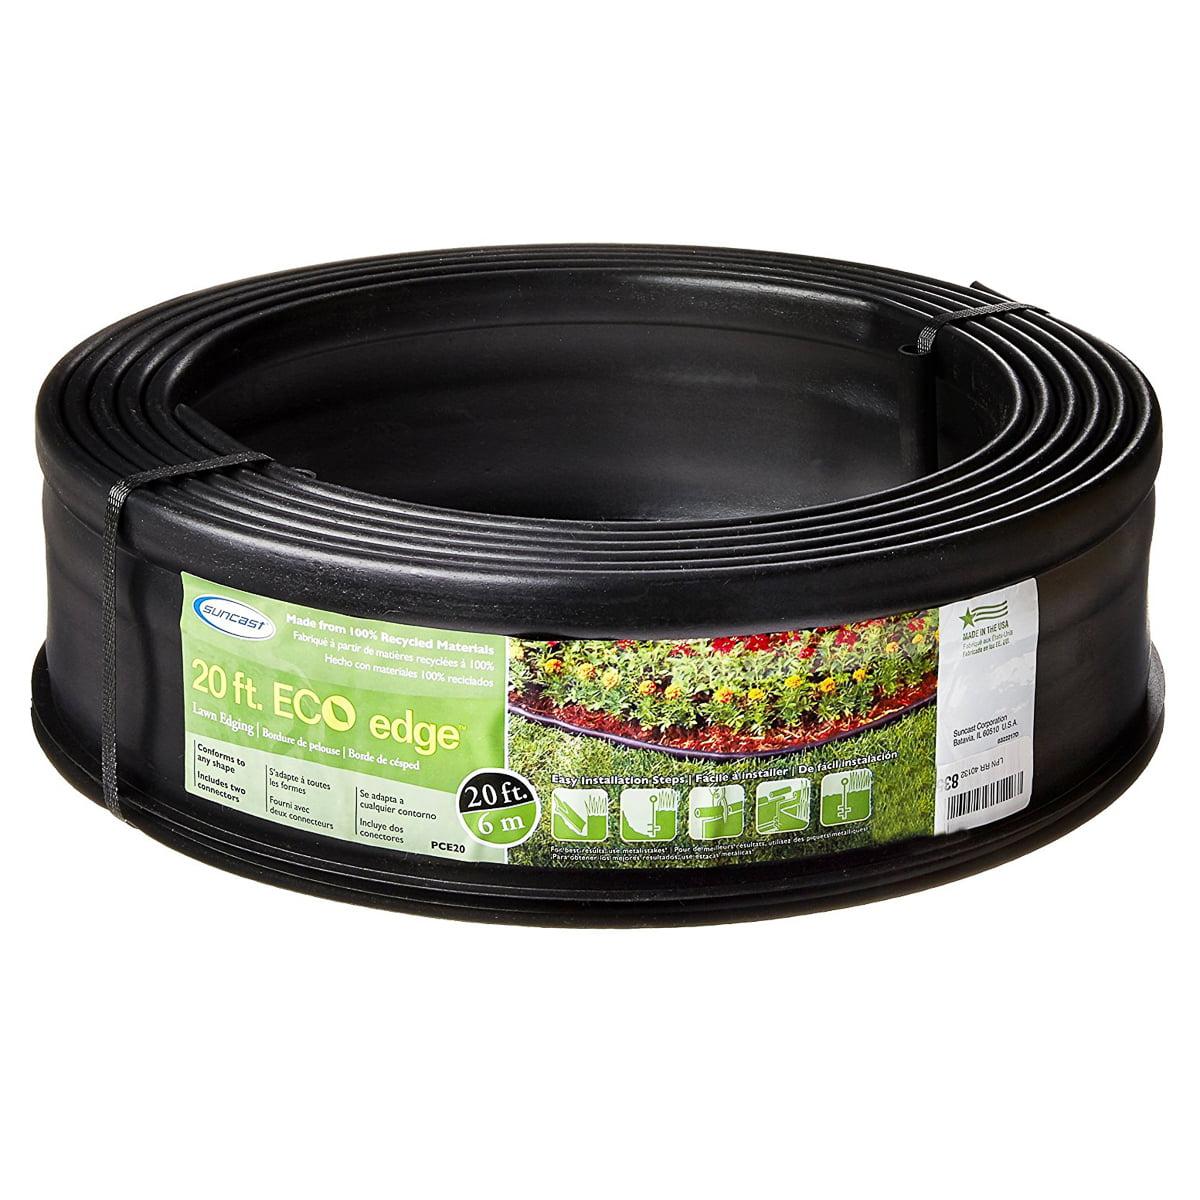 "Suncast 20ft x 5""H Garden Landscape Edging Easy Install Weather-Resistant Lawn Edging Border Black Plastic"